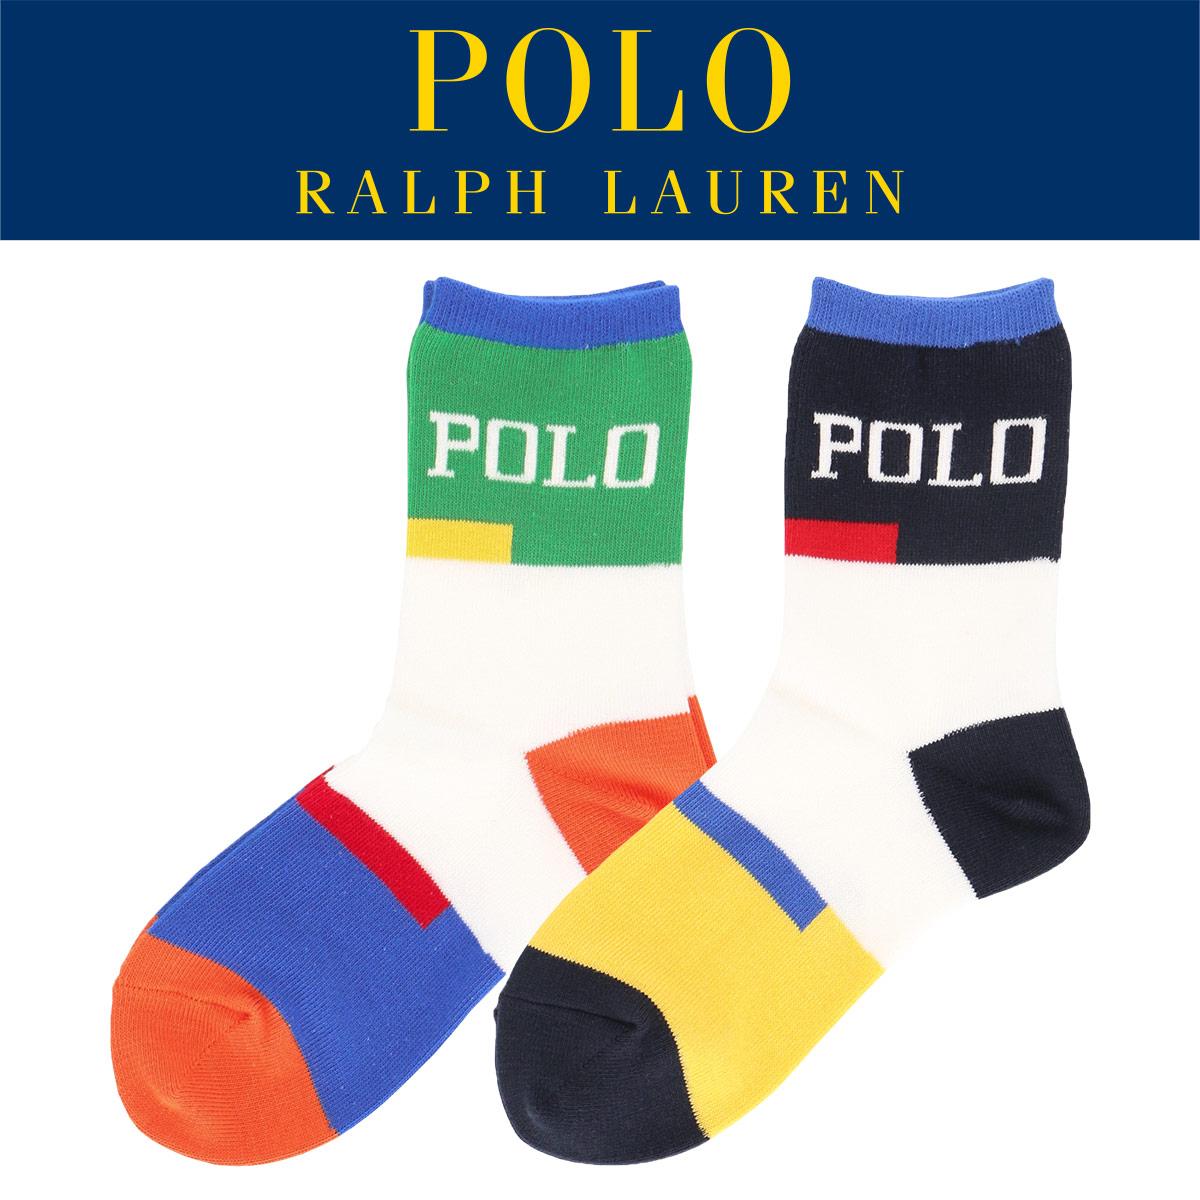 POLO RALPH LAUREN ポロ ラルフローレン|キッズ ジュニア 子供 ボーイズ 男の子 靴下|POLOロゴ|カラーブロック|クルーソックス|4863-510【ゆうパケット・4点まで】